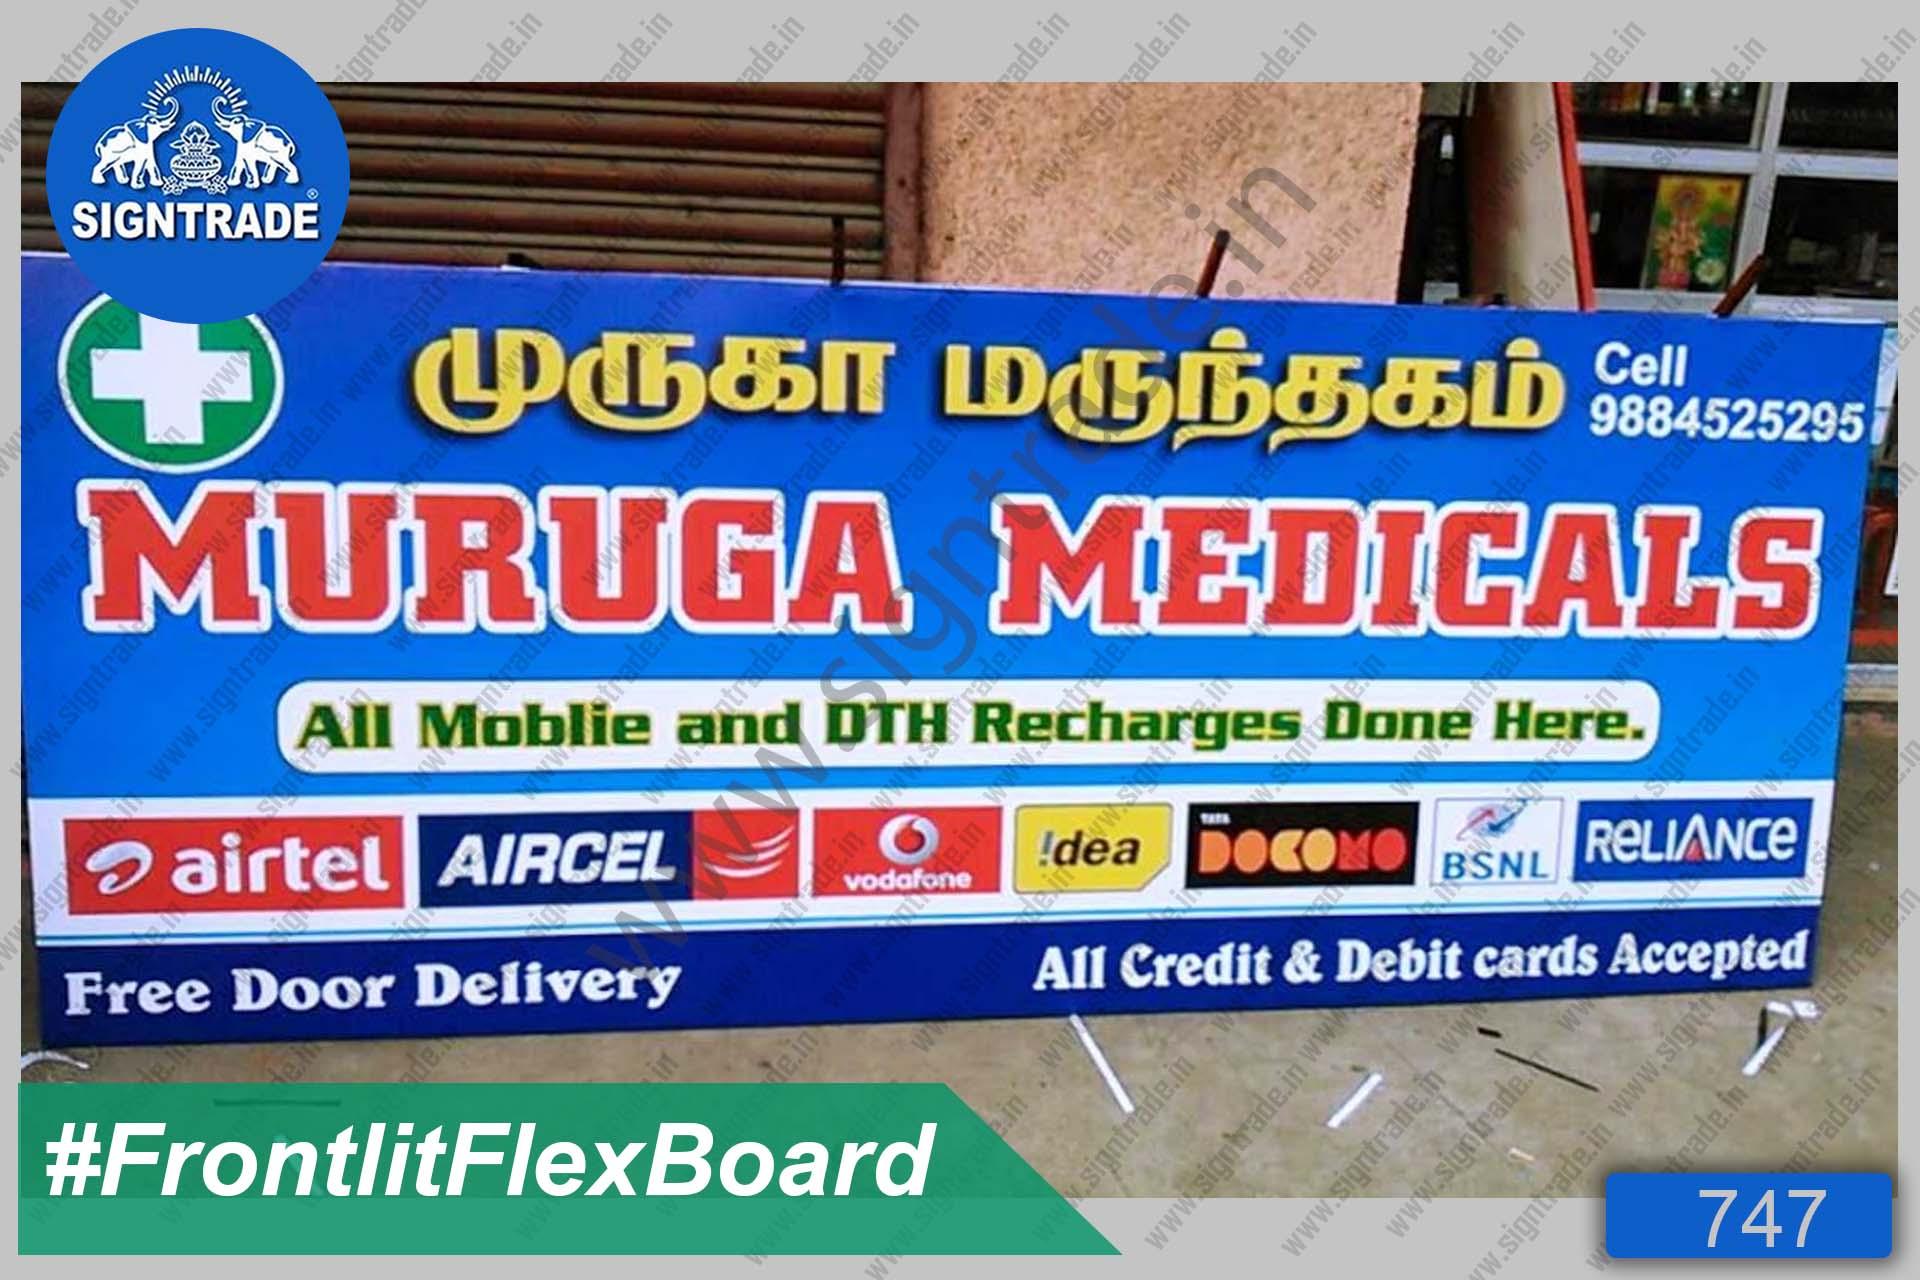 Muruga Medicals - Frontlit Flex Board